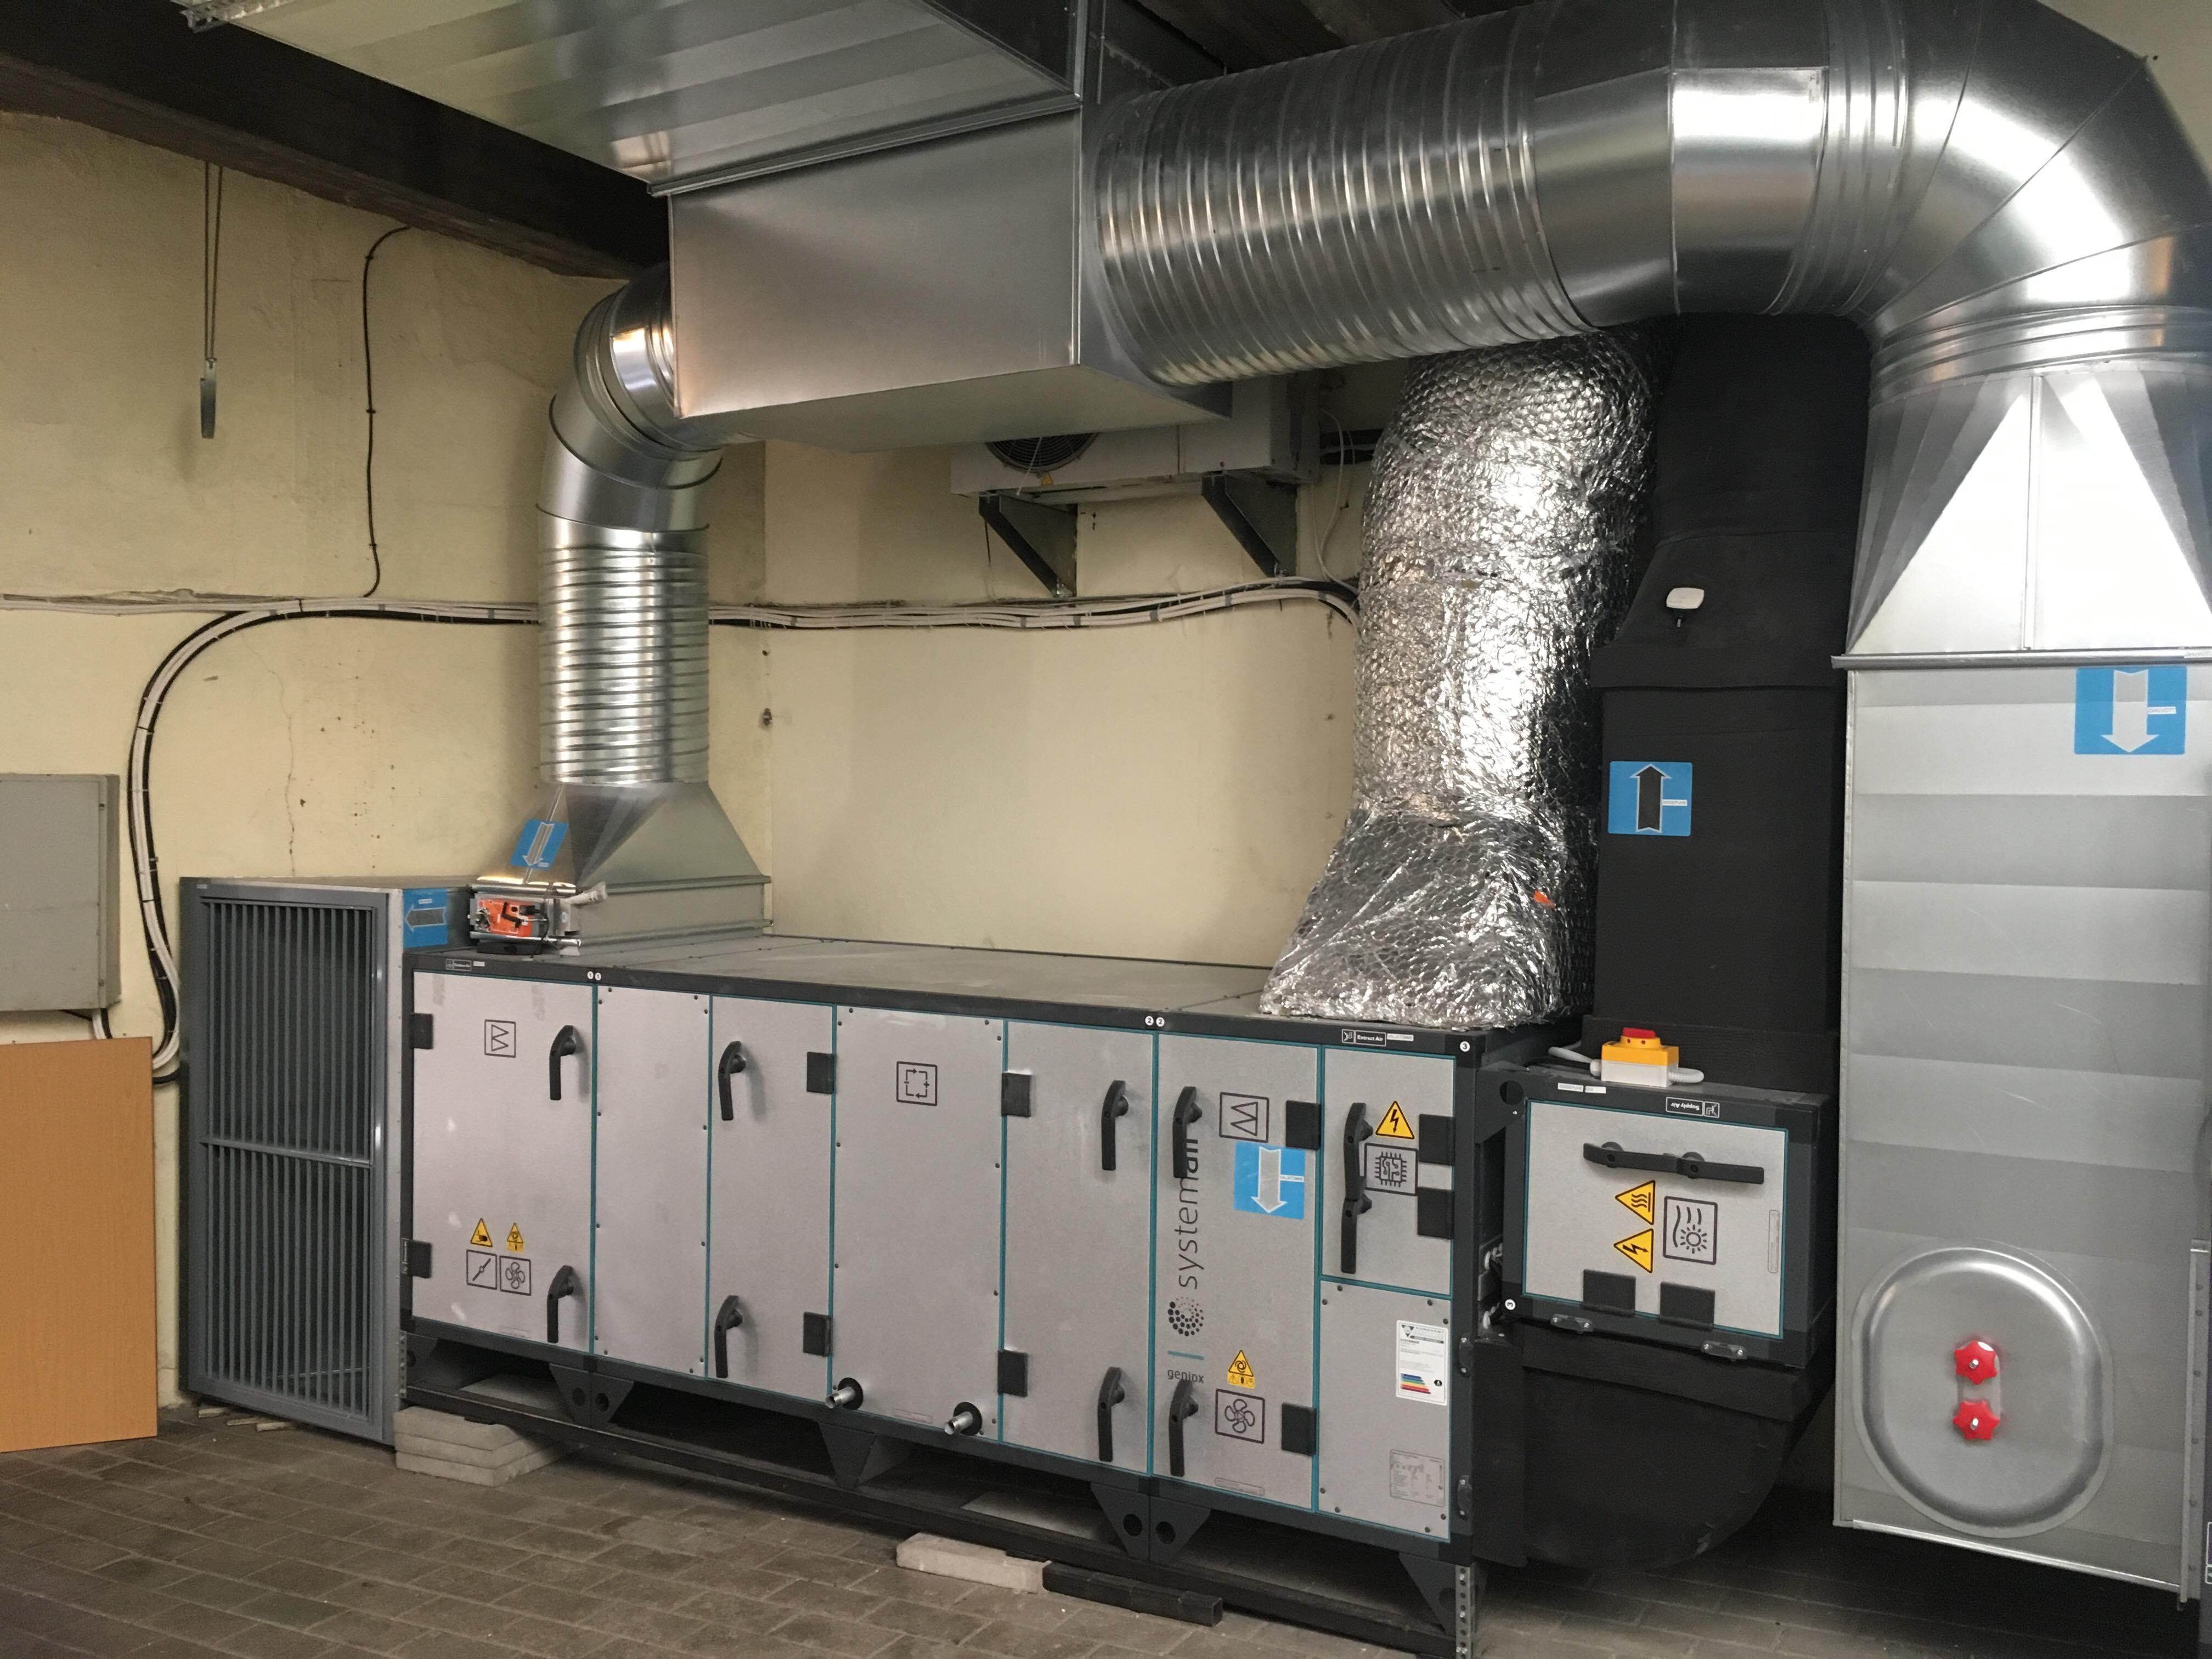 estonia restoran ventilatsioonisüsteem 4